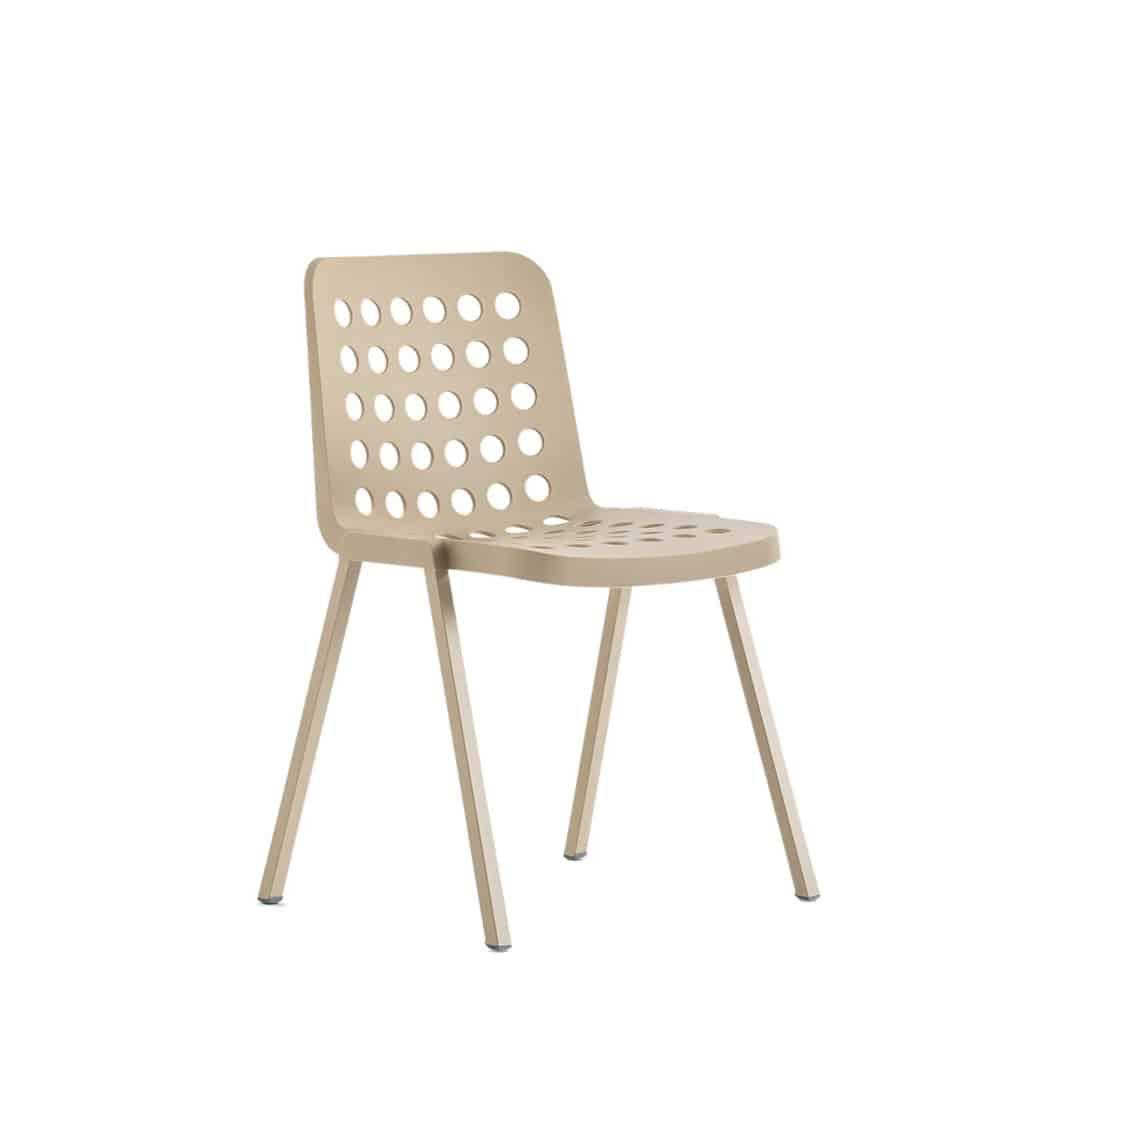 KOI side chair-BOOKI-370 Sand Pedrali at DeFrae Contract Furniture Hero